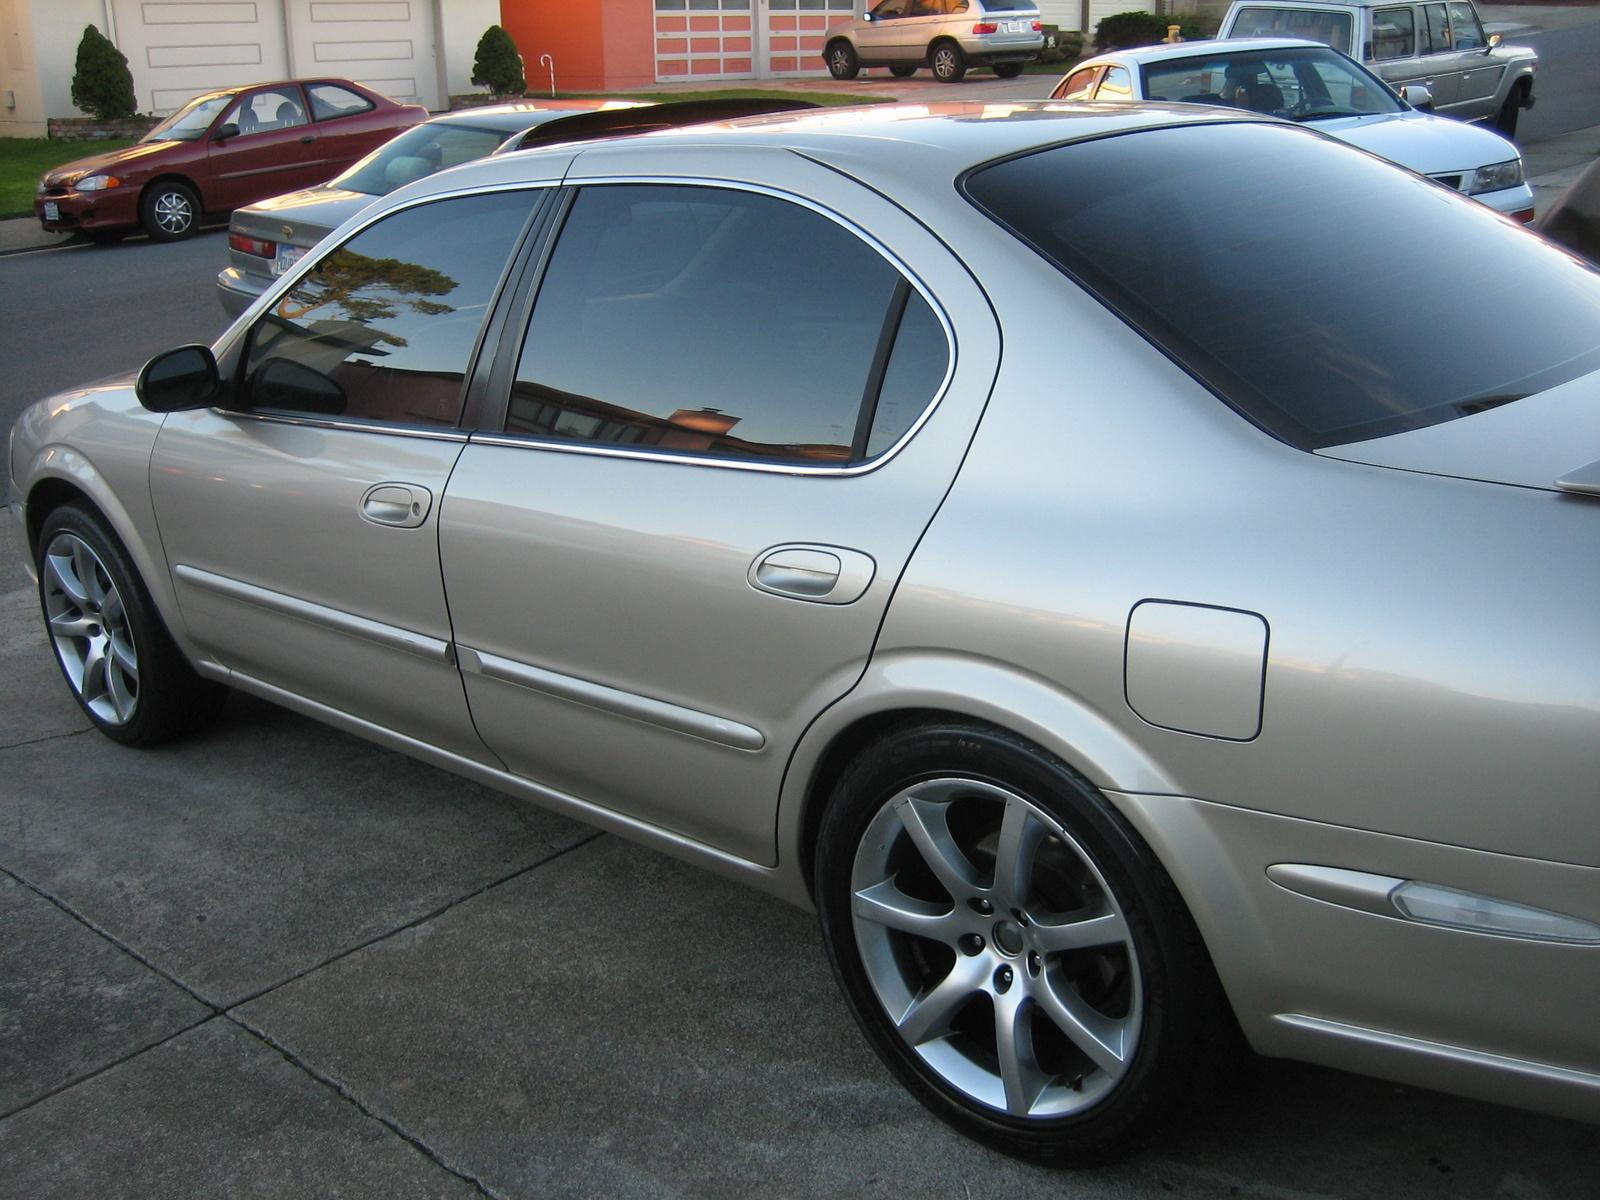 Nissan Dealership Nj 2000 Nissan Maxima Consumer Reviews Edmunds | Autos Post